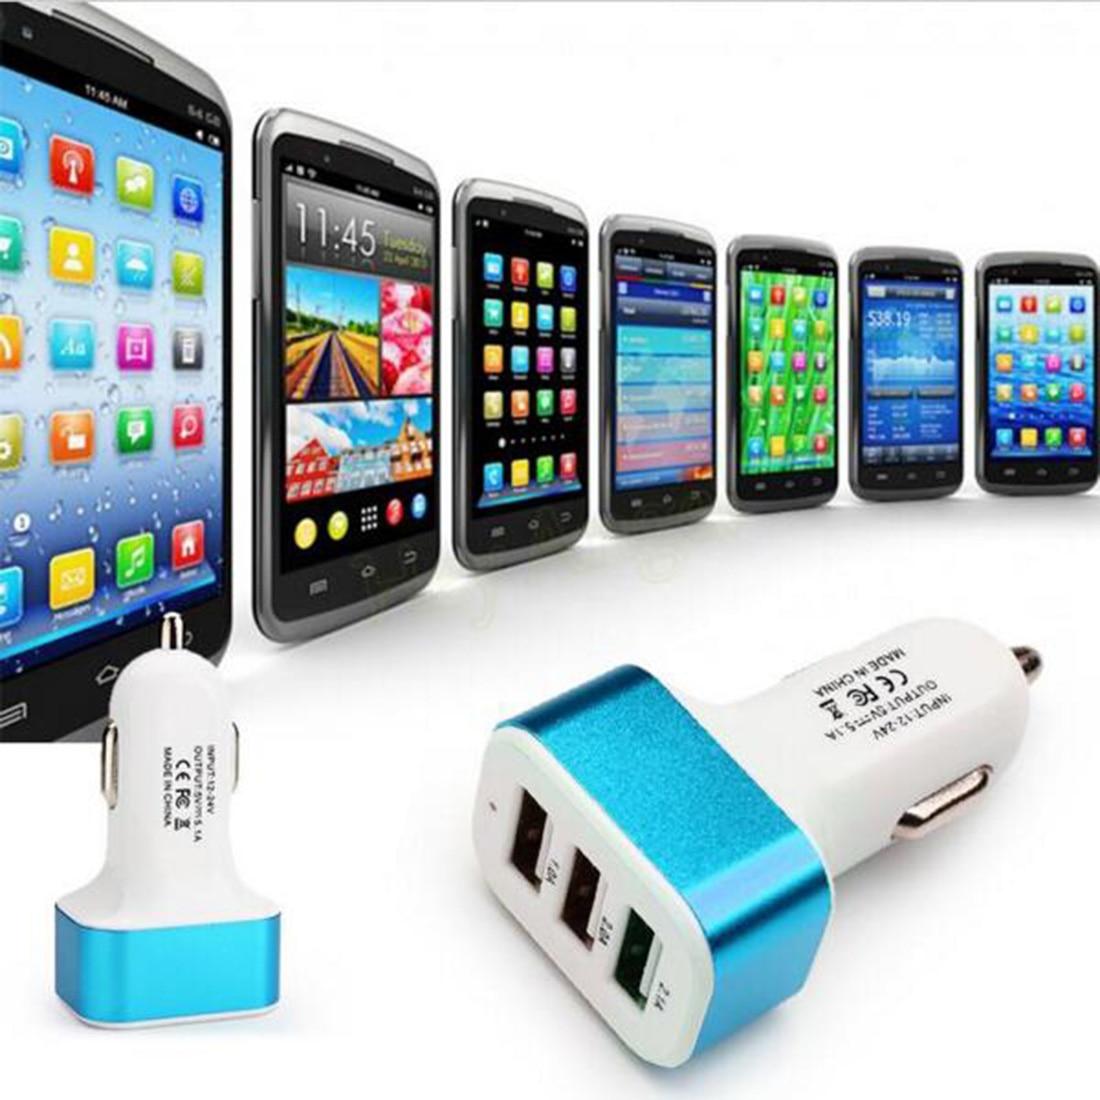 Etmakit nuevo y poderoso 5V 2.1A 3 Puerto USB cargador de coche para iPhone 6S 6 Plus iPad aire mini 2 3 Galaxy S7 S6 Edge + Nota 5